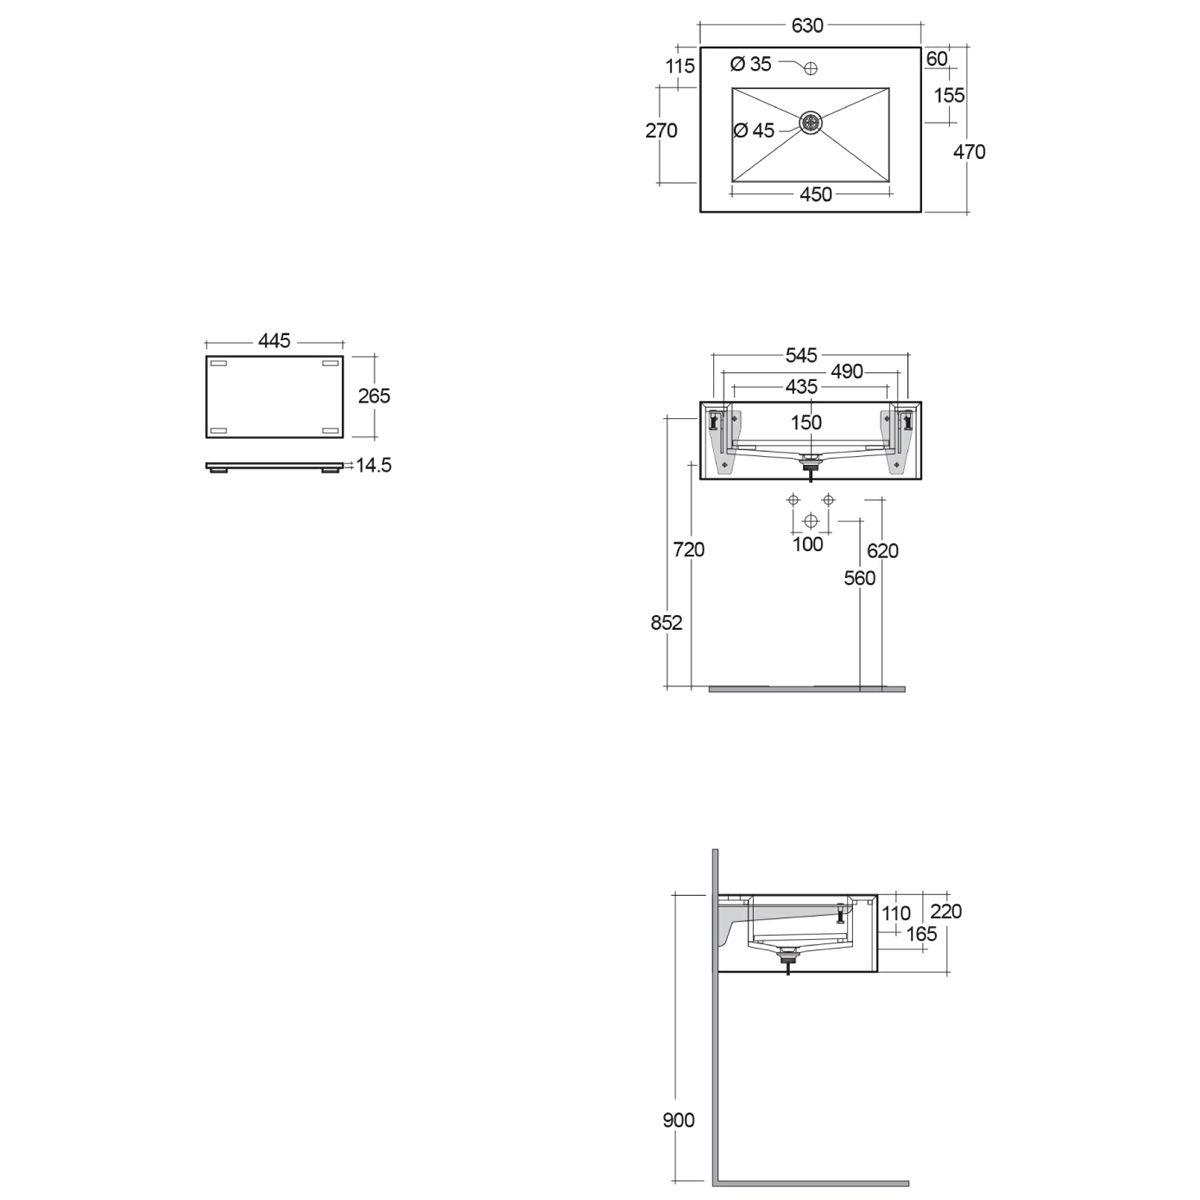 RAK Precious Macaubus Wall Hung Counter Basin with Bracket Measurements